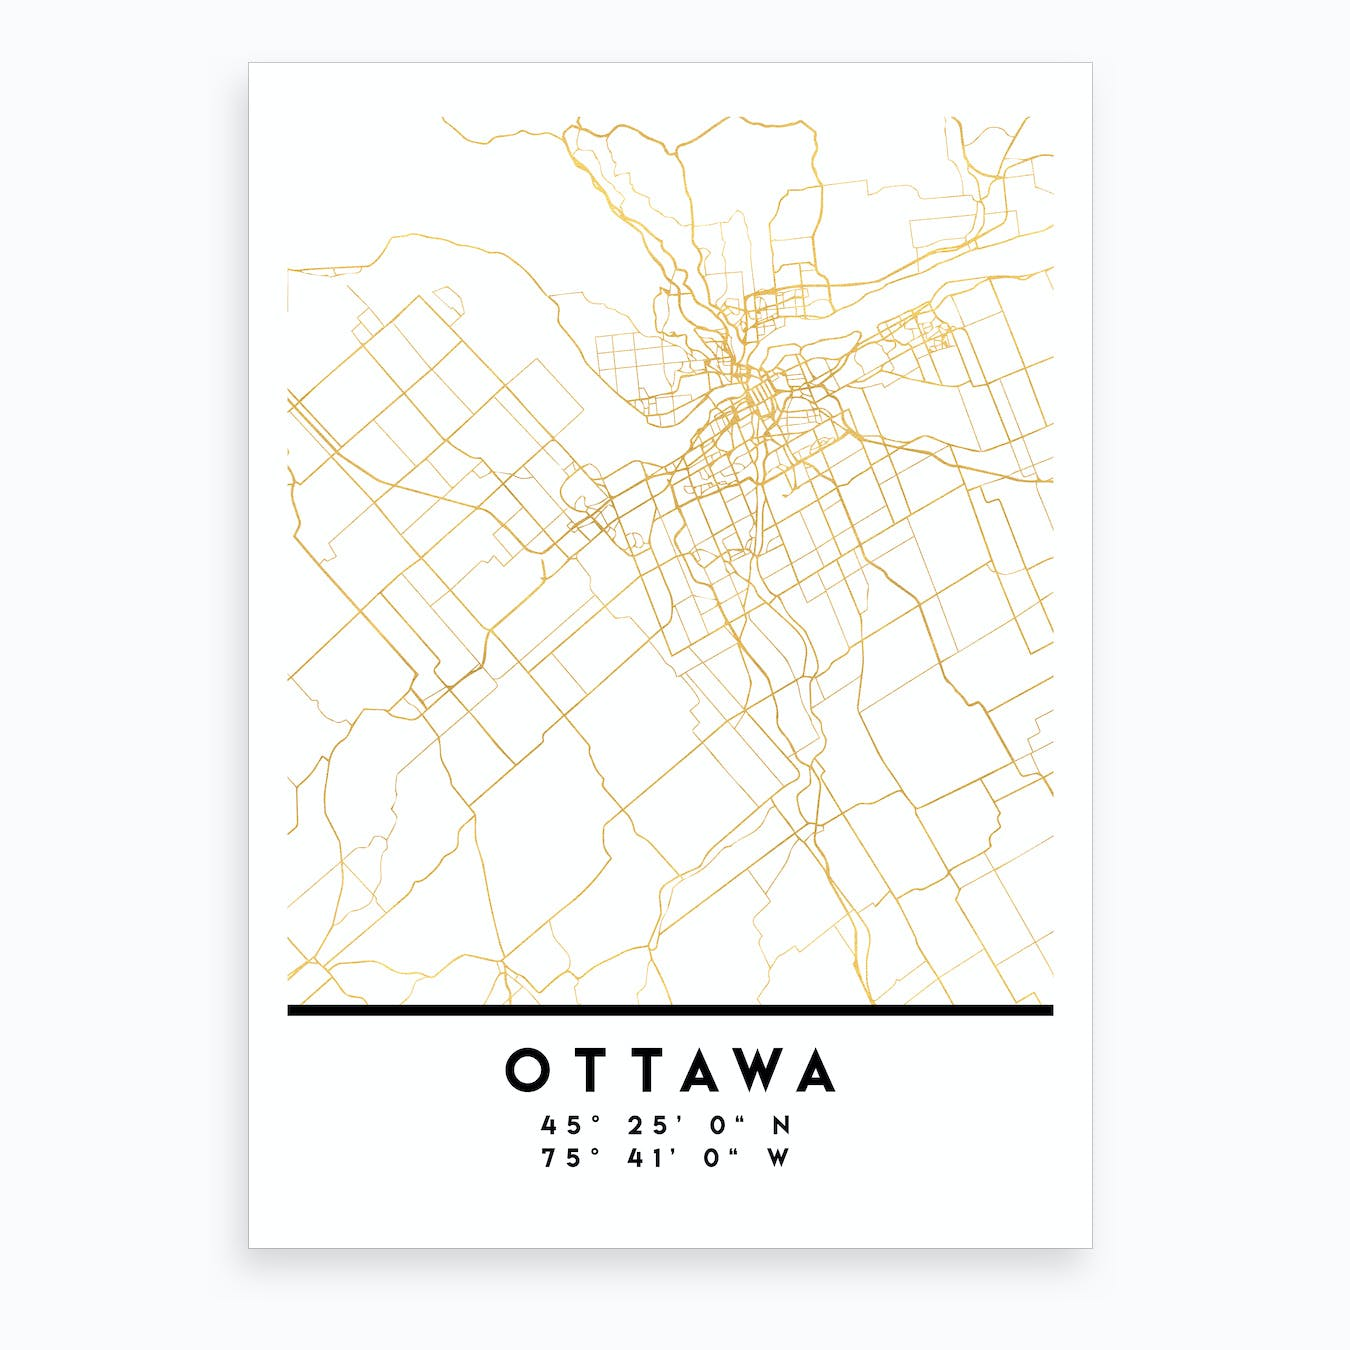 Ottawa Canada City Street Map